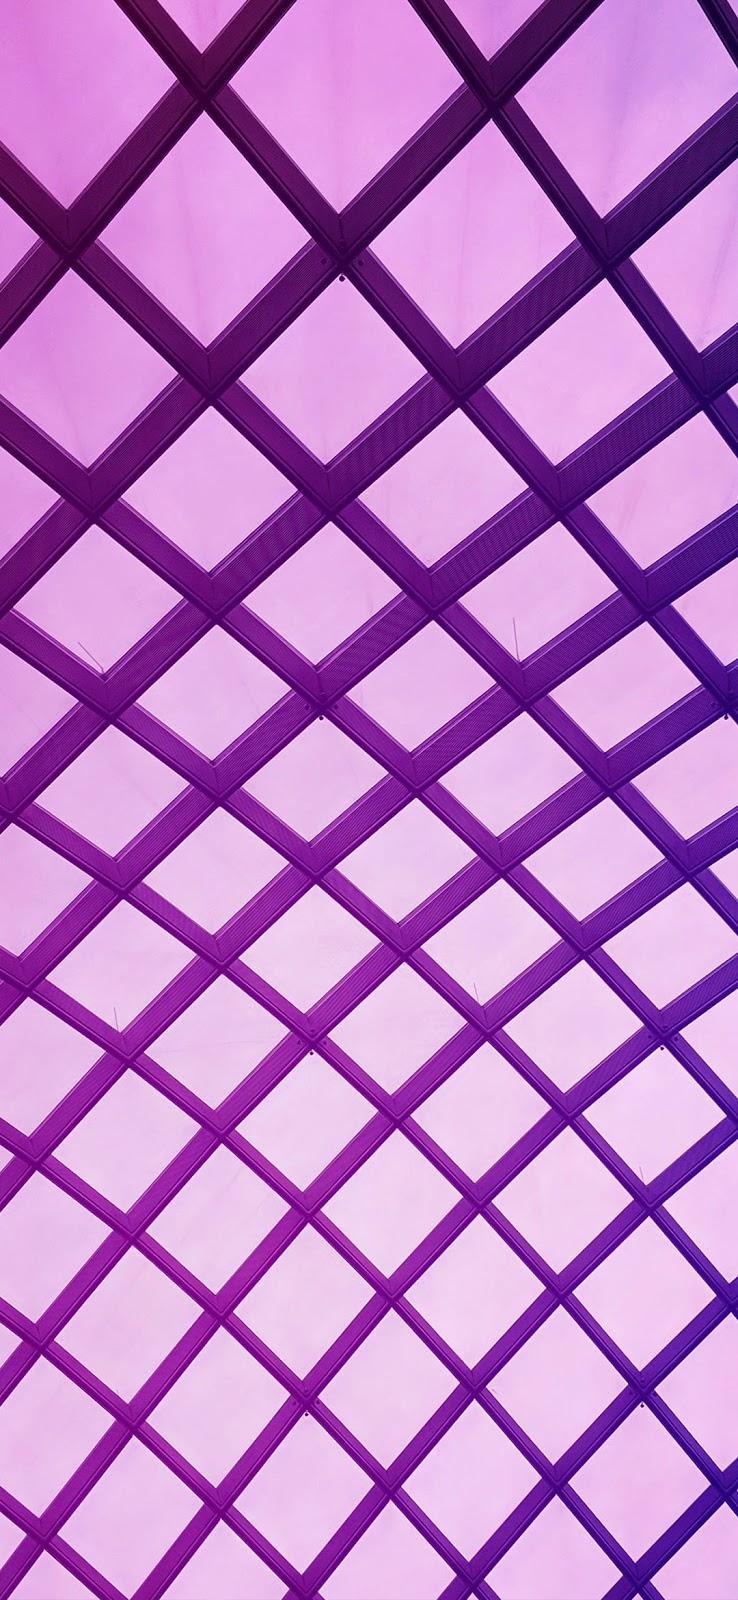 cool black and purple mesh illustration